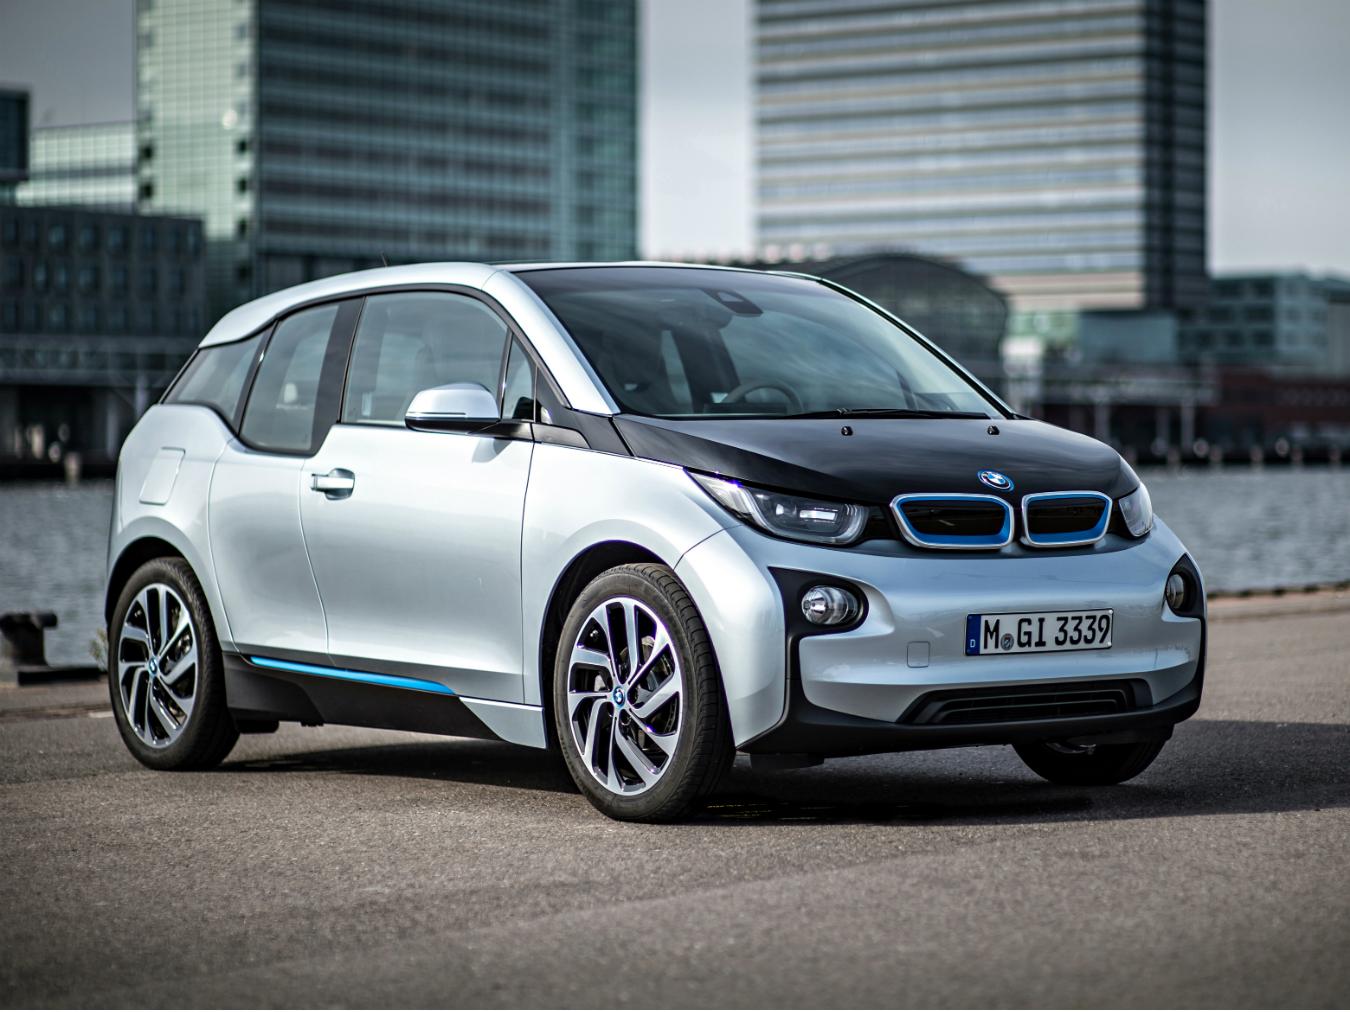 MONTECRISTO Blog: The BMW i3